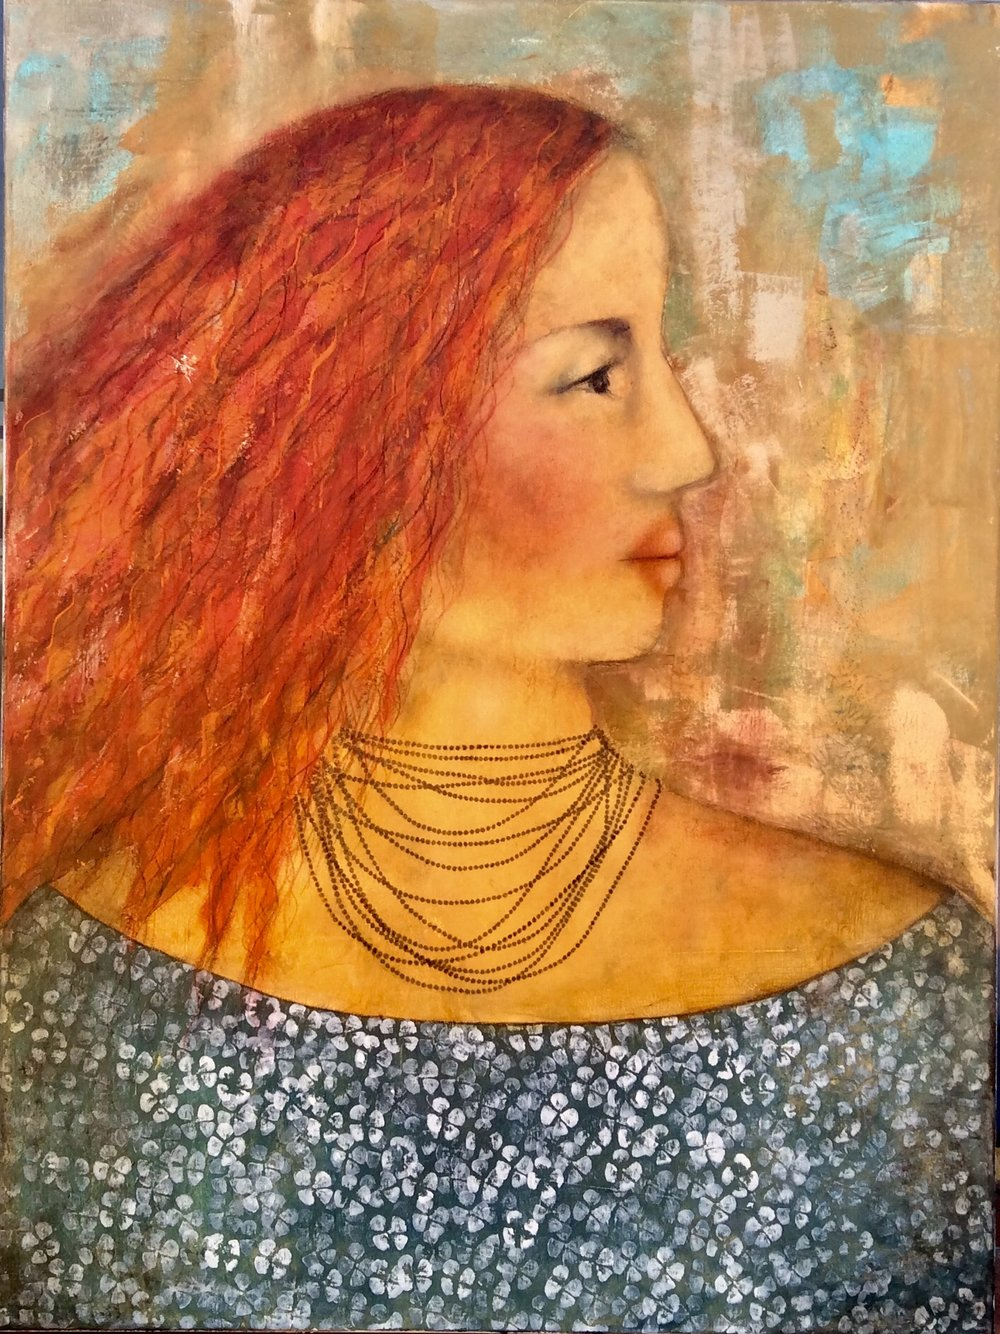 Nineteen Strings  Dalene Meiring , oils on canvas, 765mm x 1020mm  $3,500.00